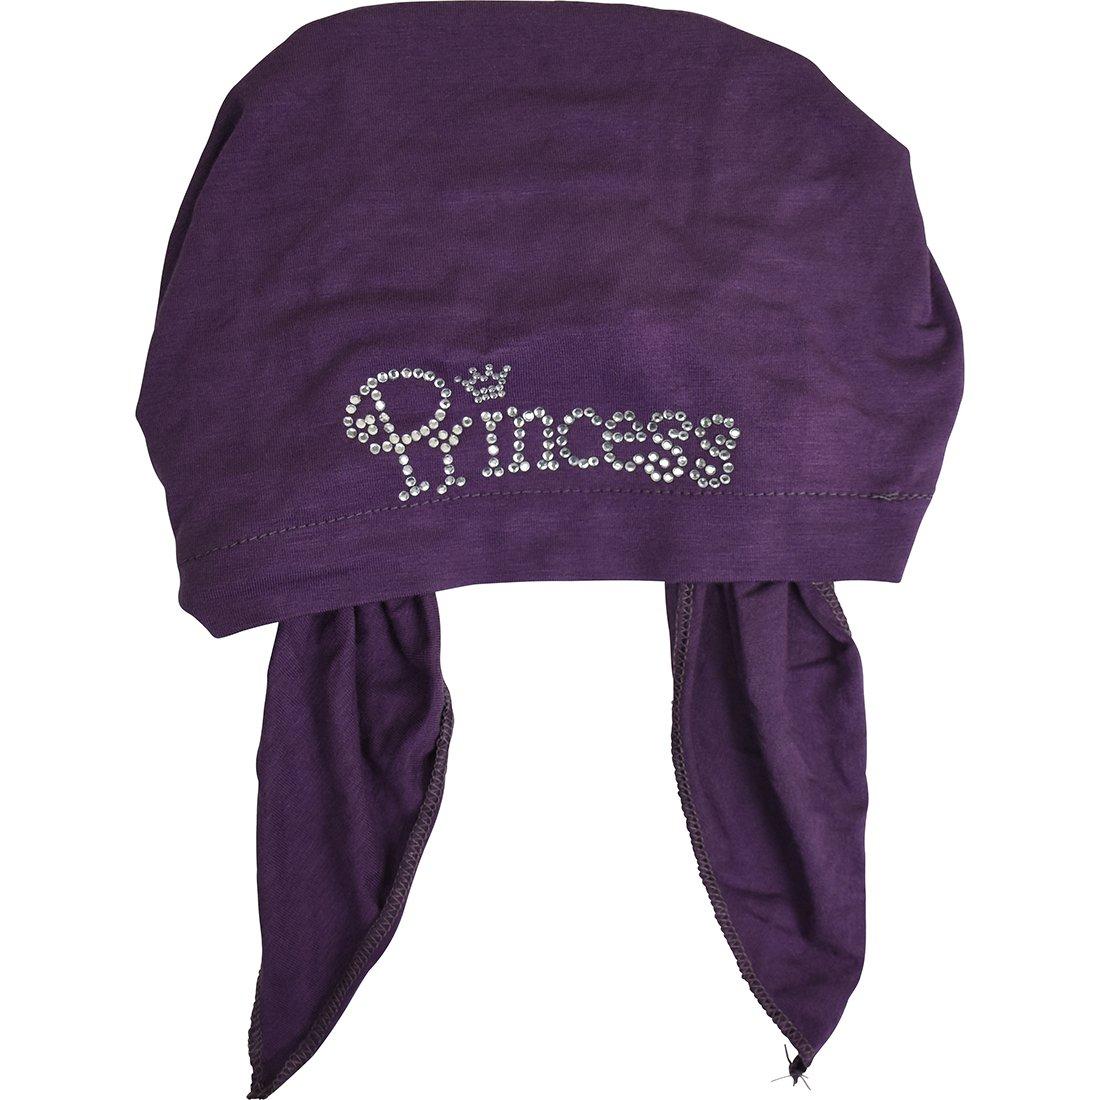 Princess Applique on Child's Pretied Head Scarf Cancer Cap Purple by Landana Headscarves (Image #3)